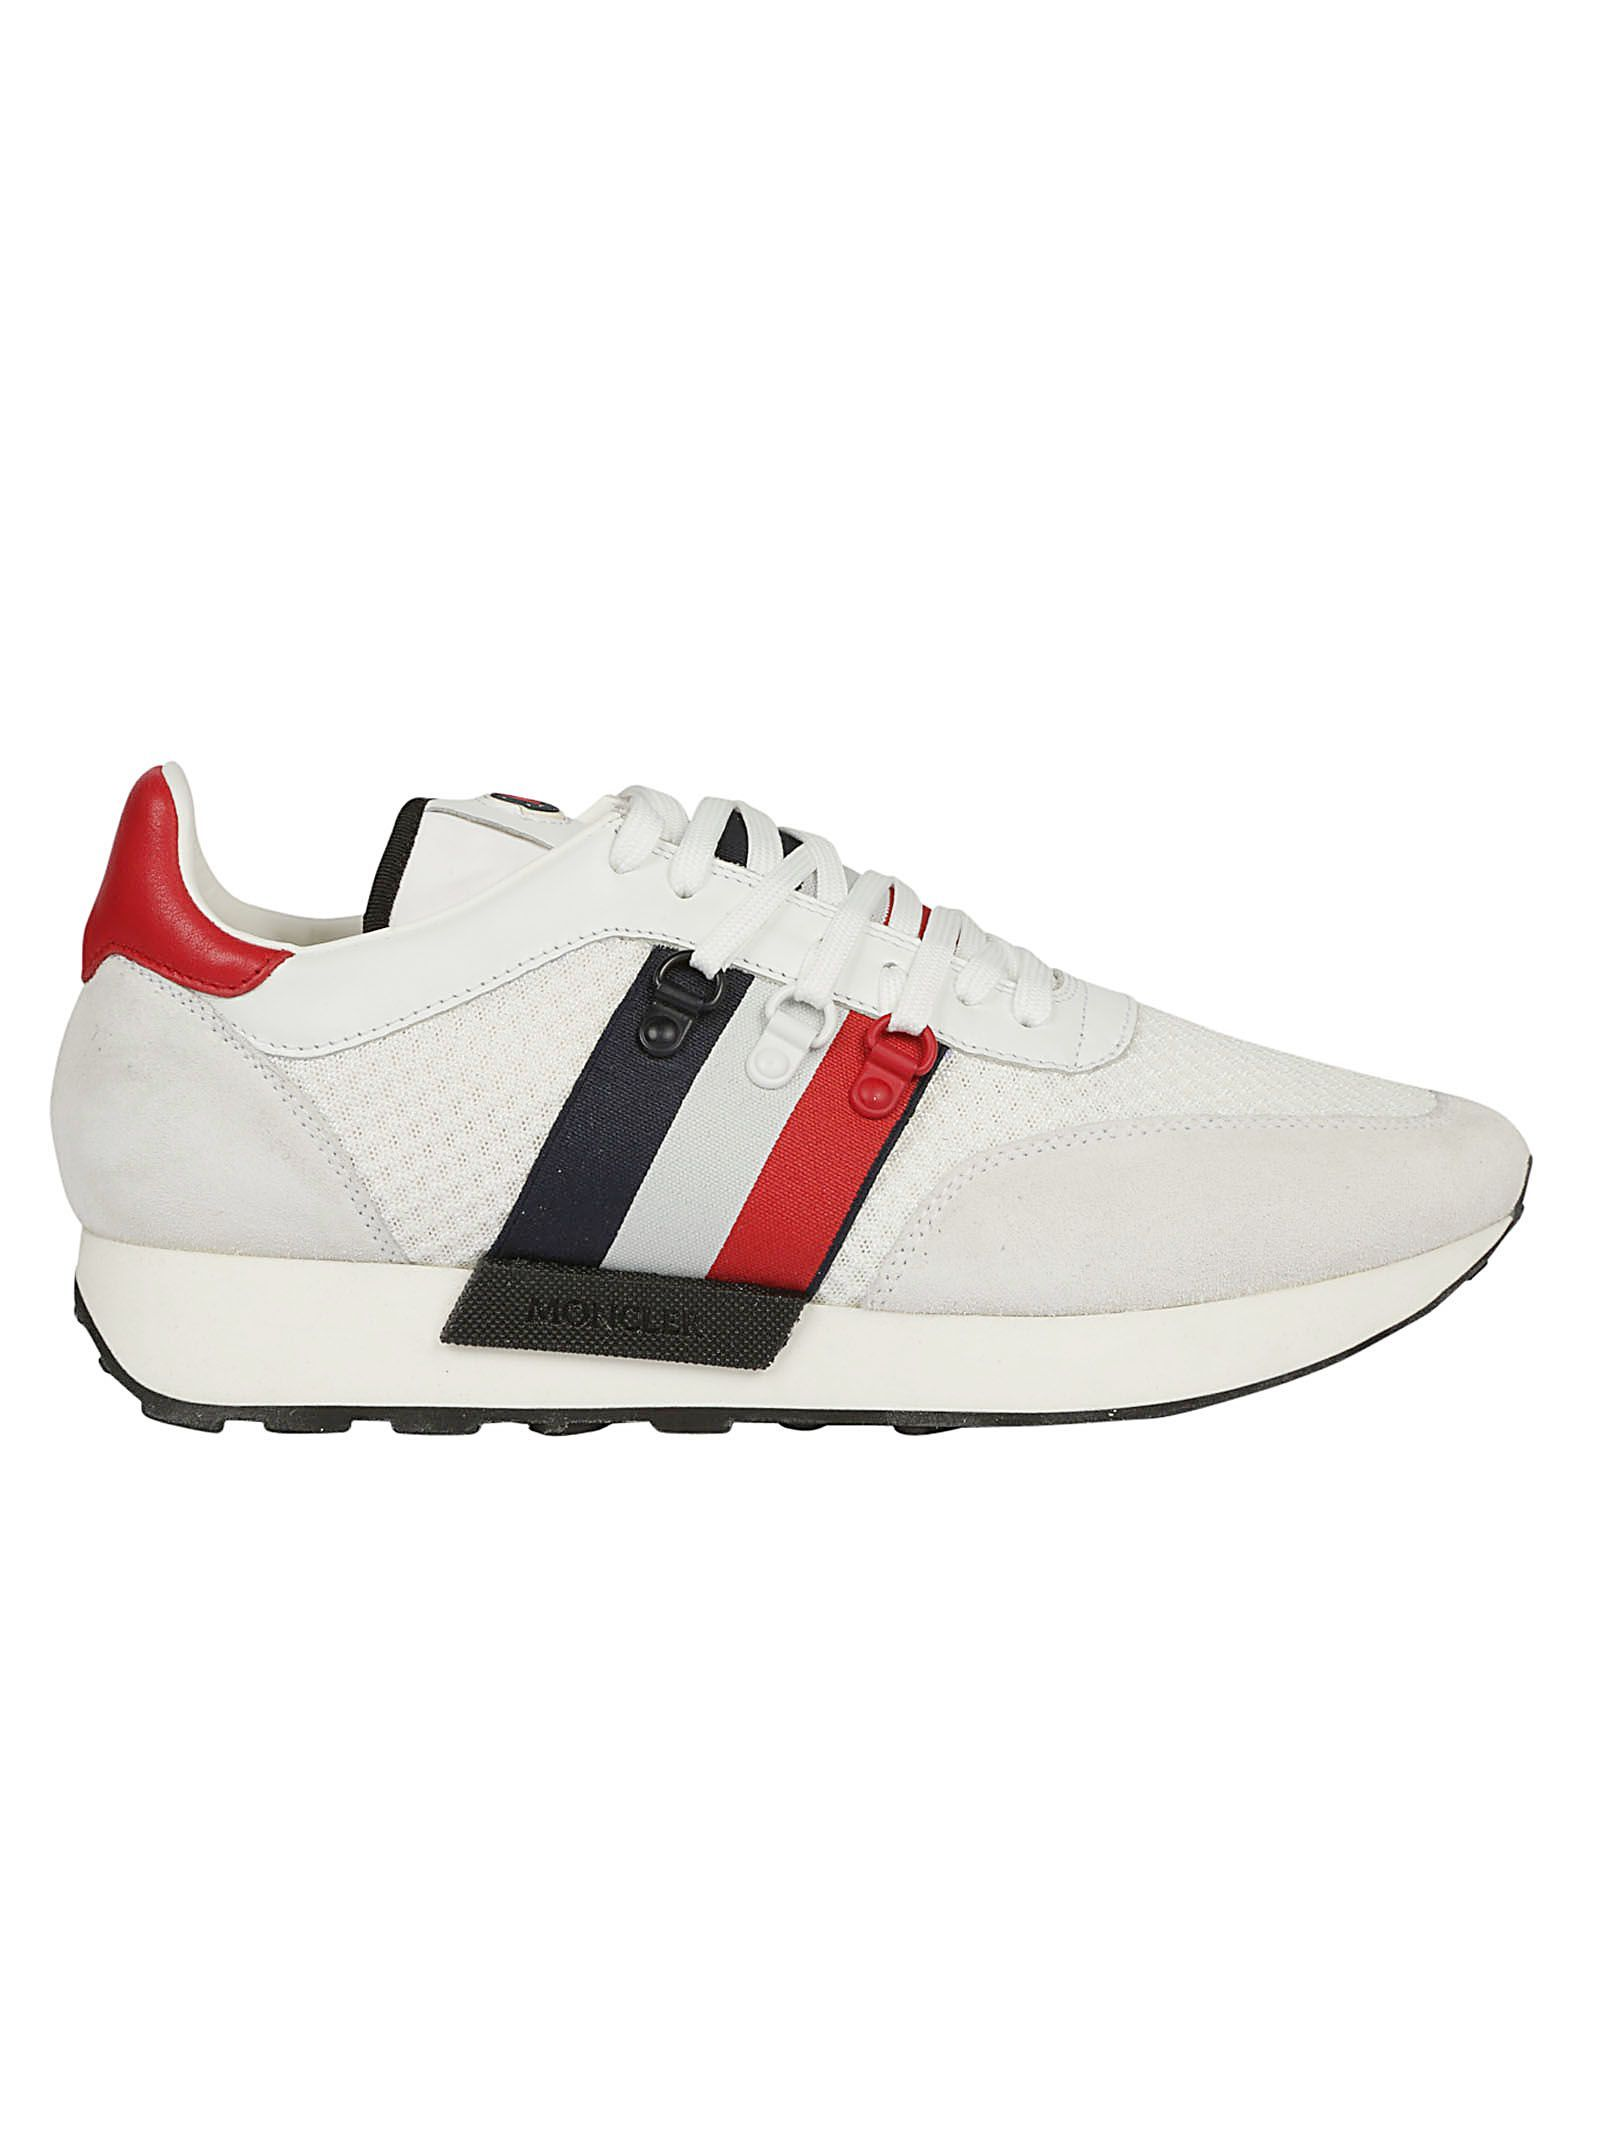 89f049c4f MONCLER NEW HORACE SNEAKERS. #moncler #shoes # | Moncler | Moncler ...